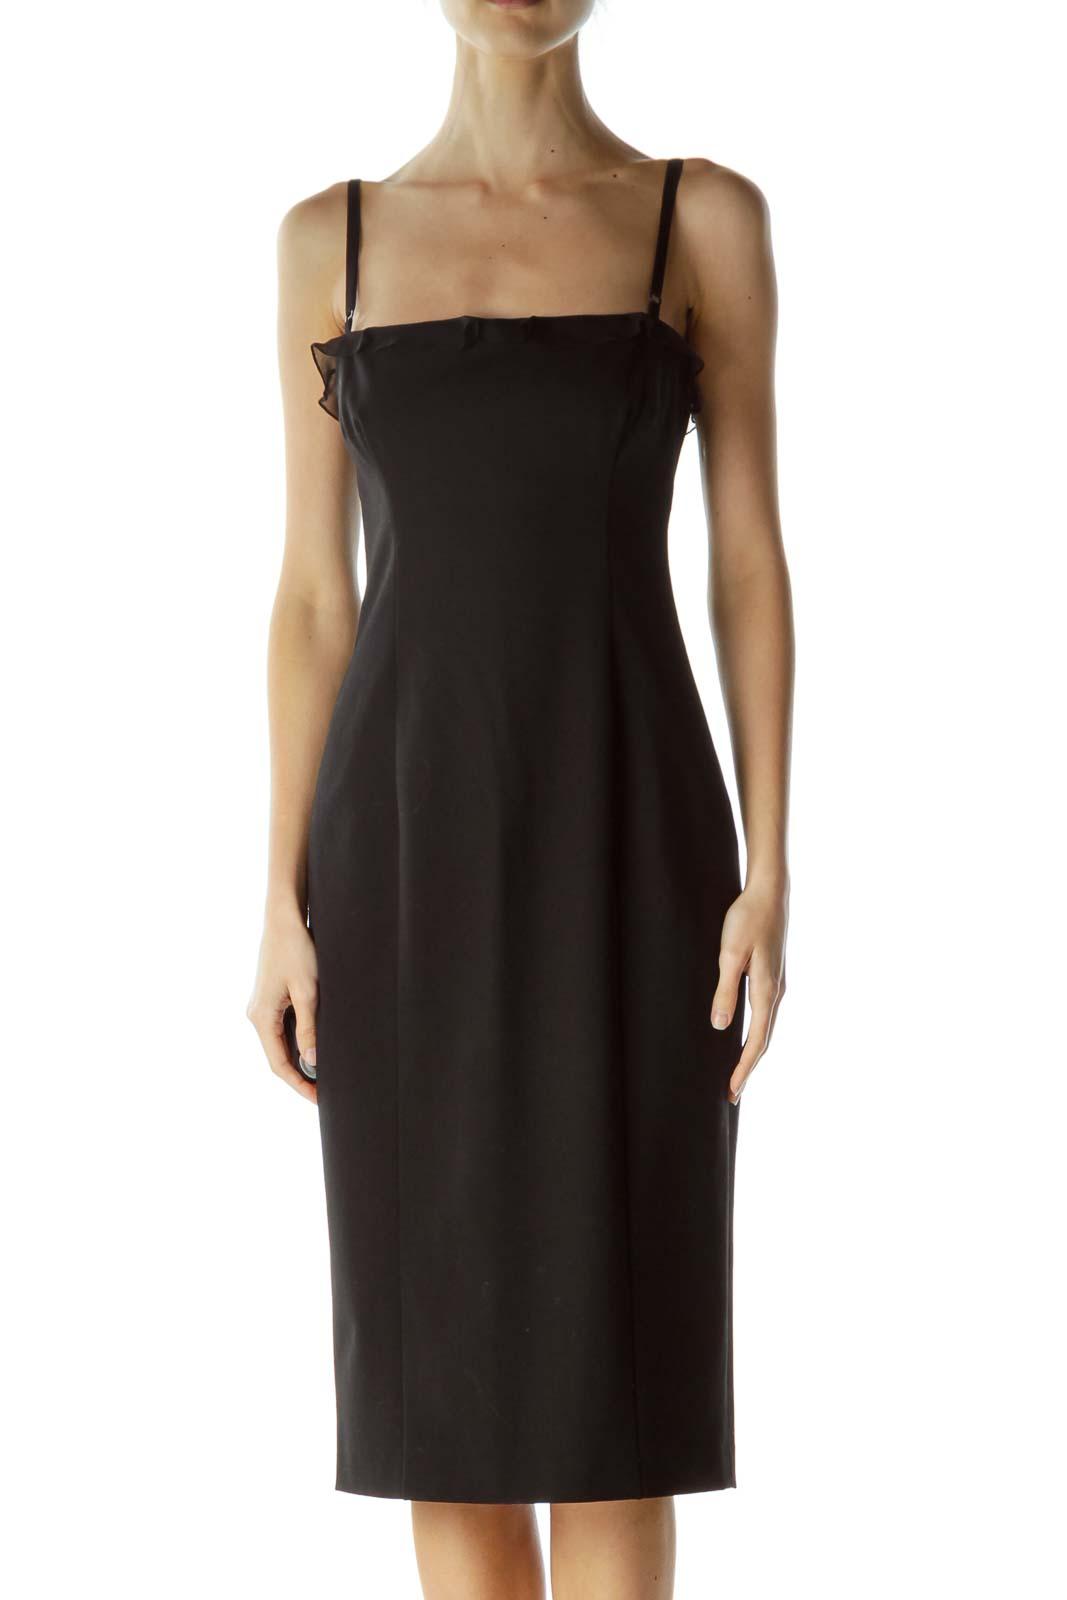 Black Spaghetti Strap Midi Cocktail Dress Front